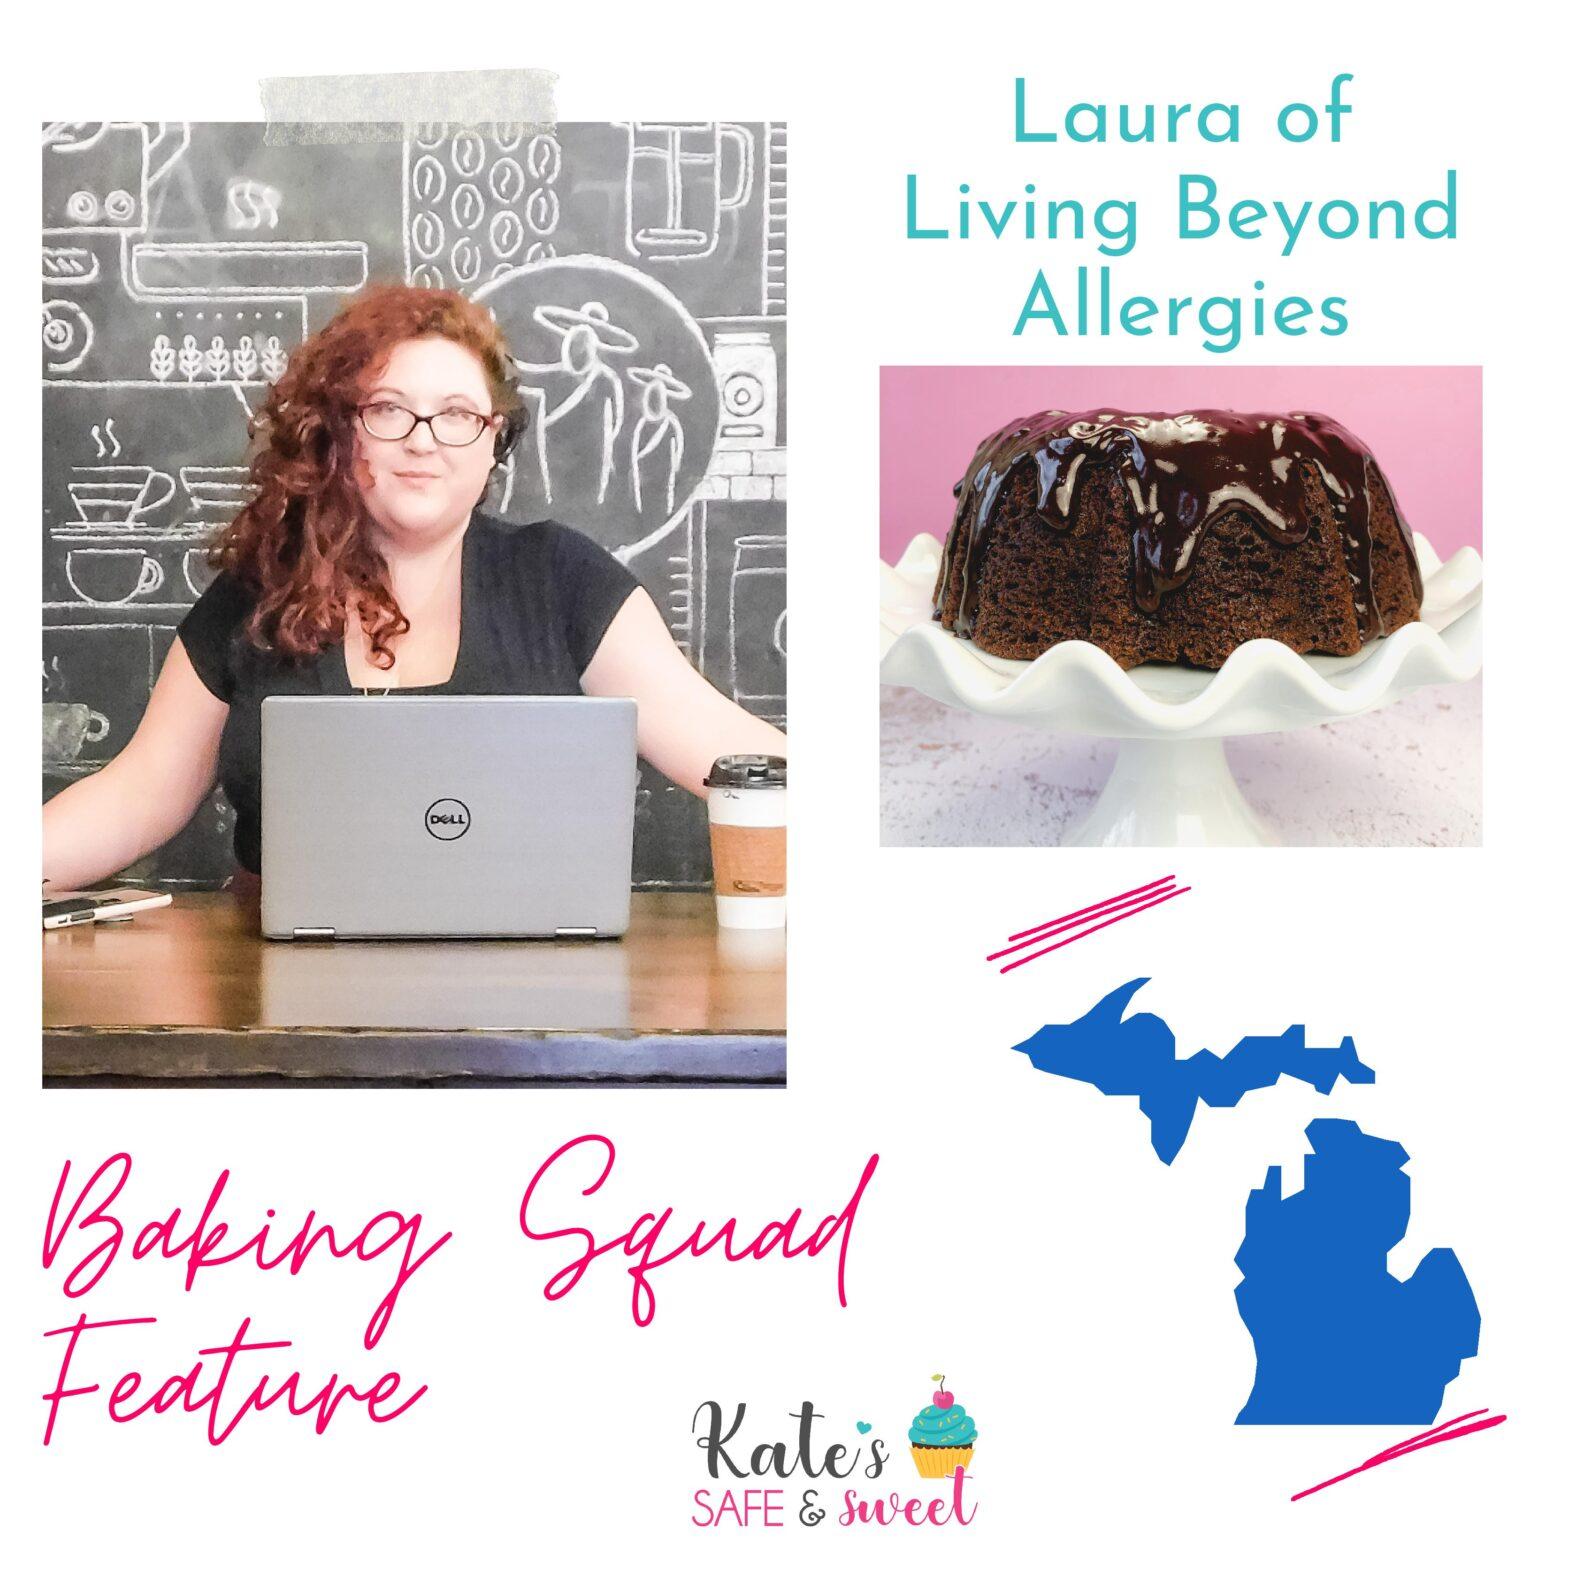 Baking Squad Feature - Laura